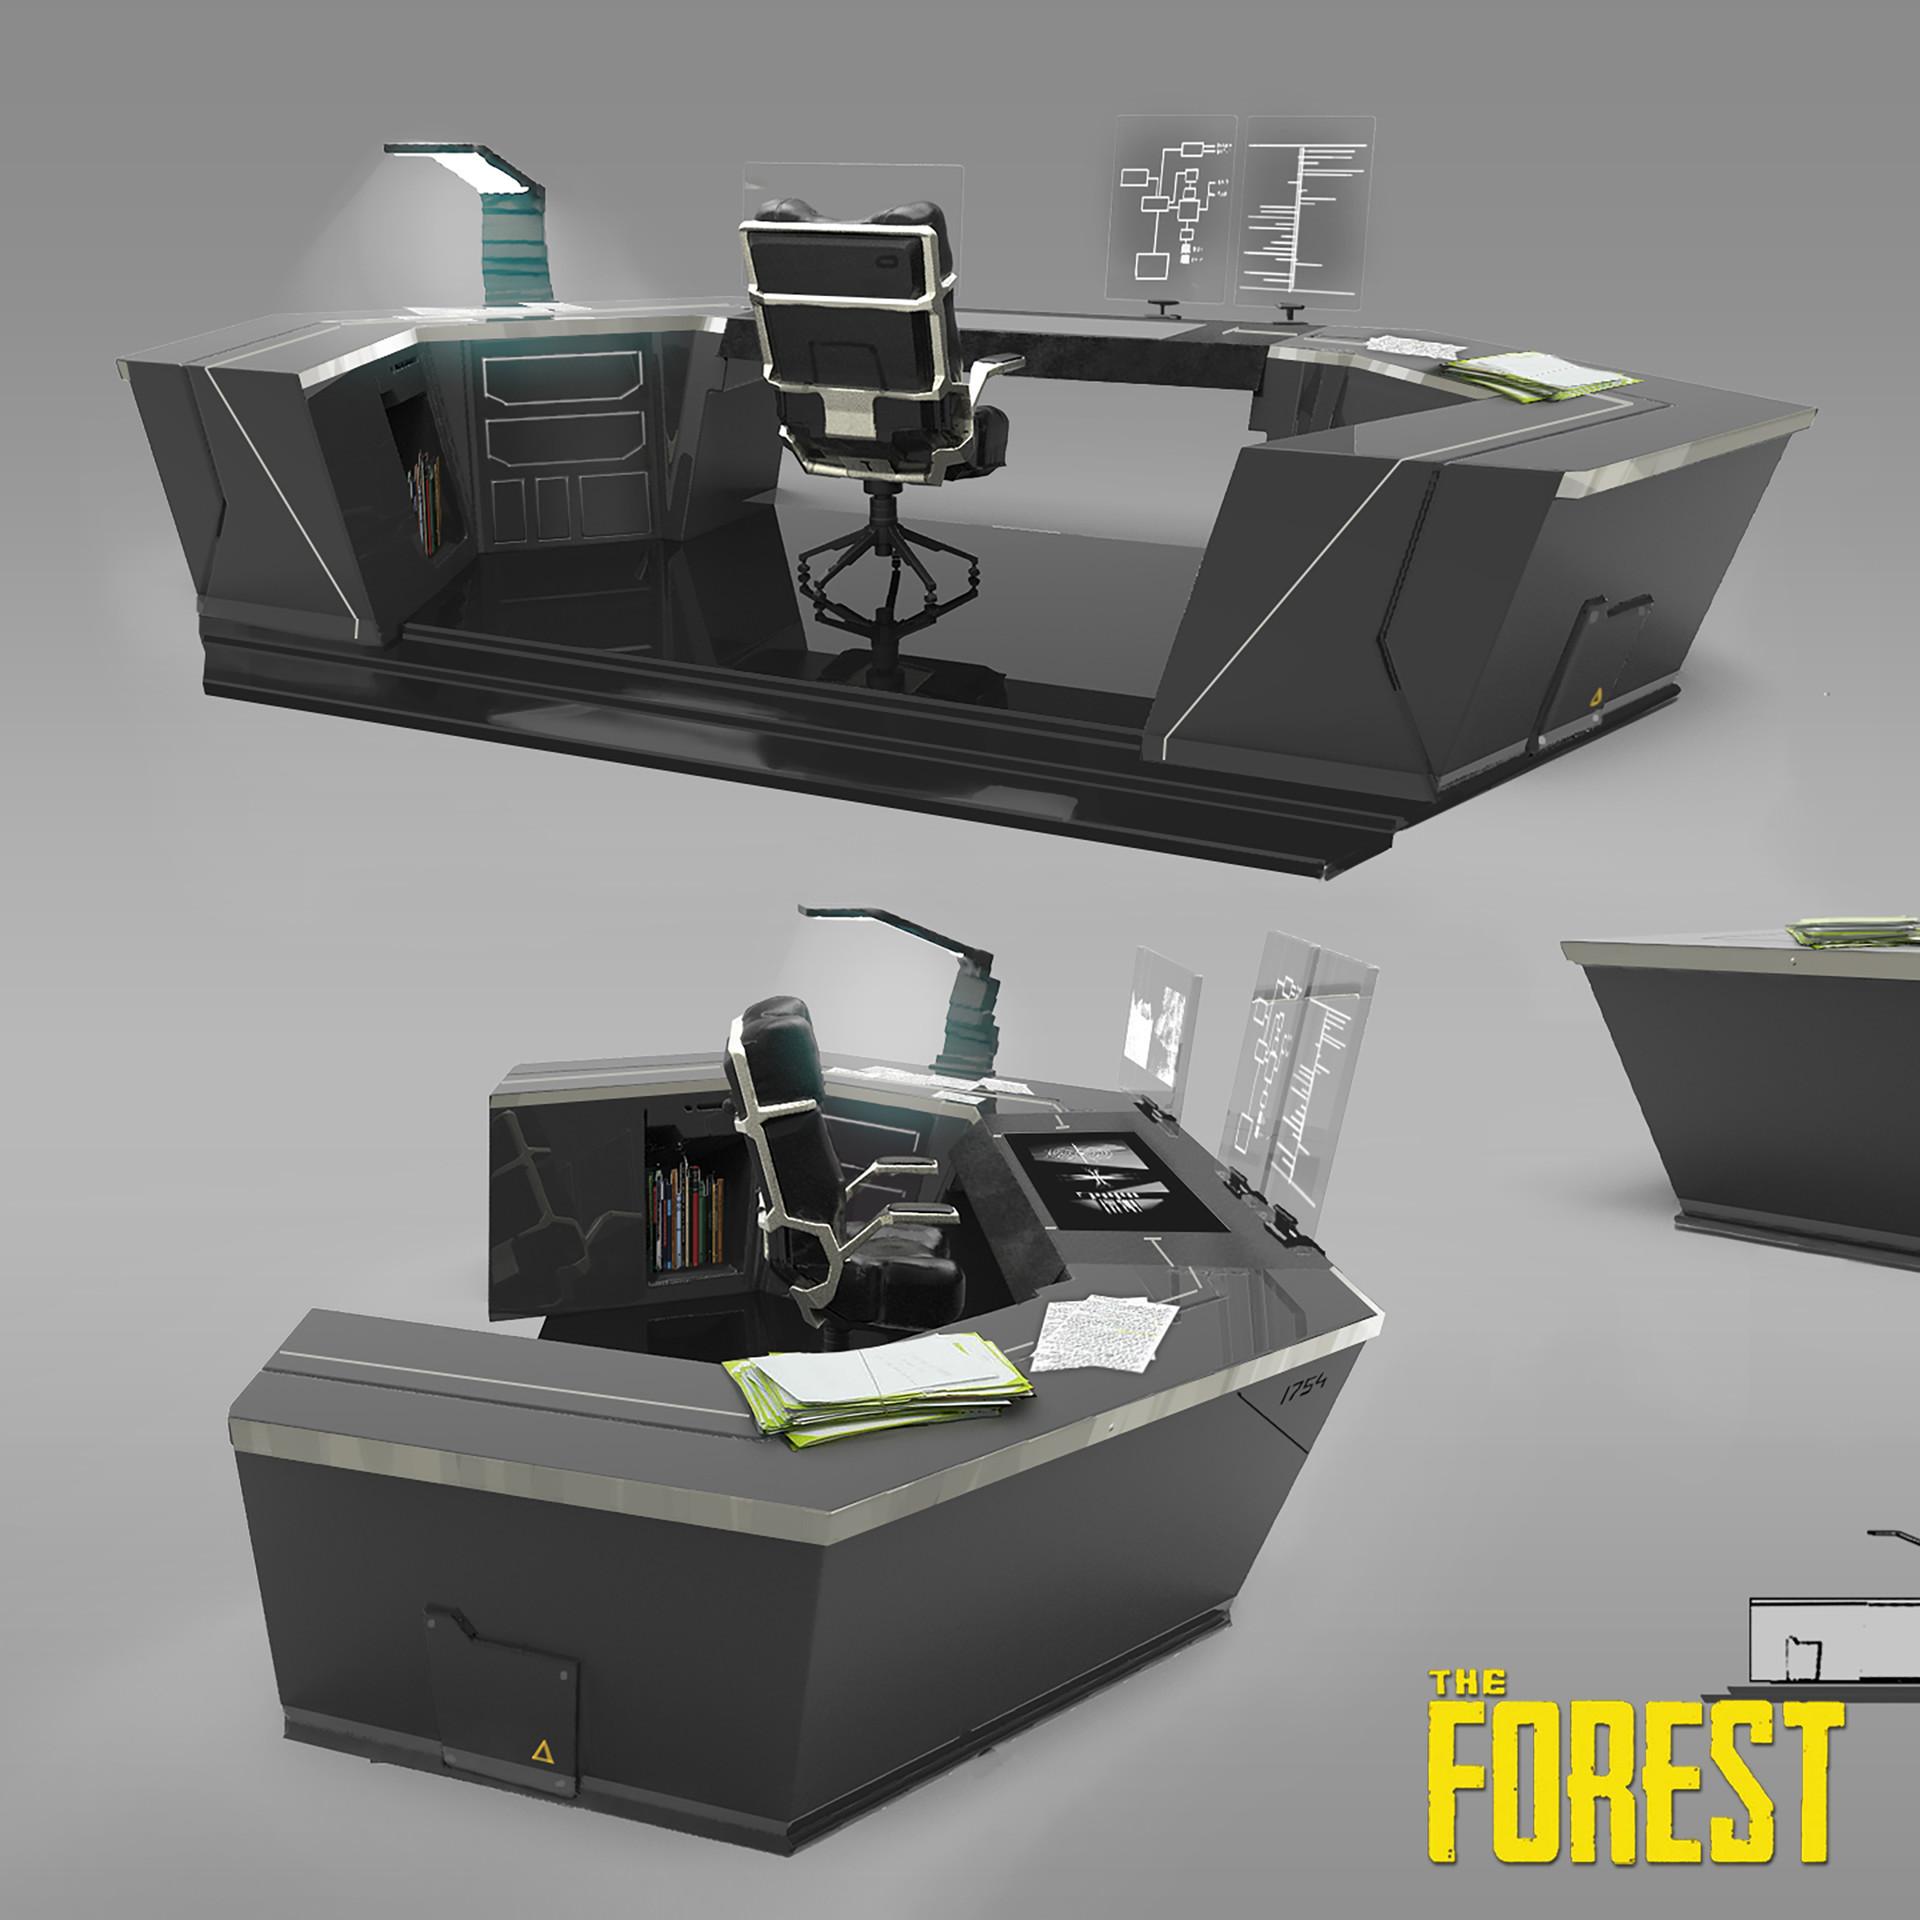 Control Room desk